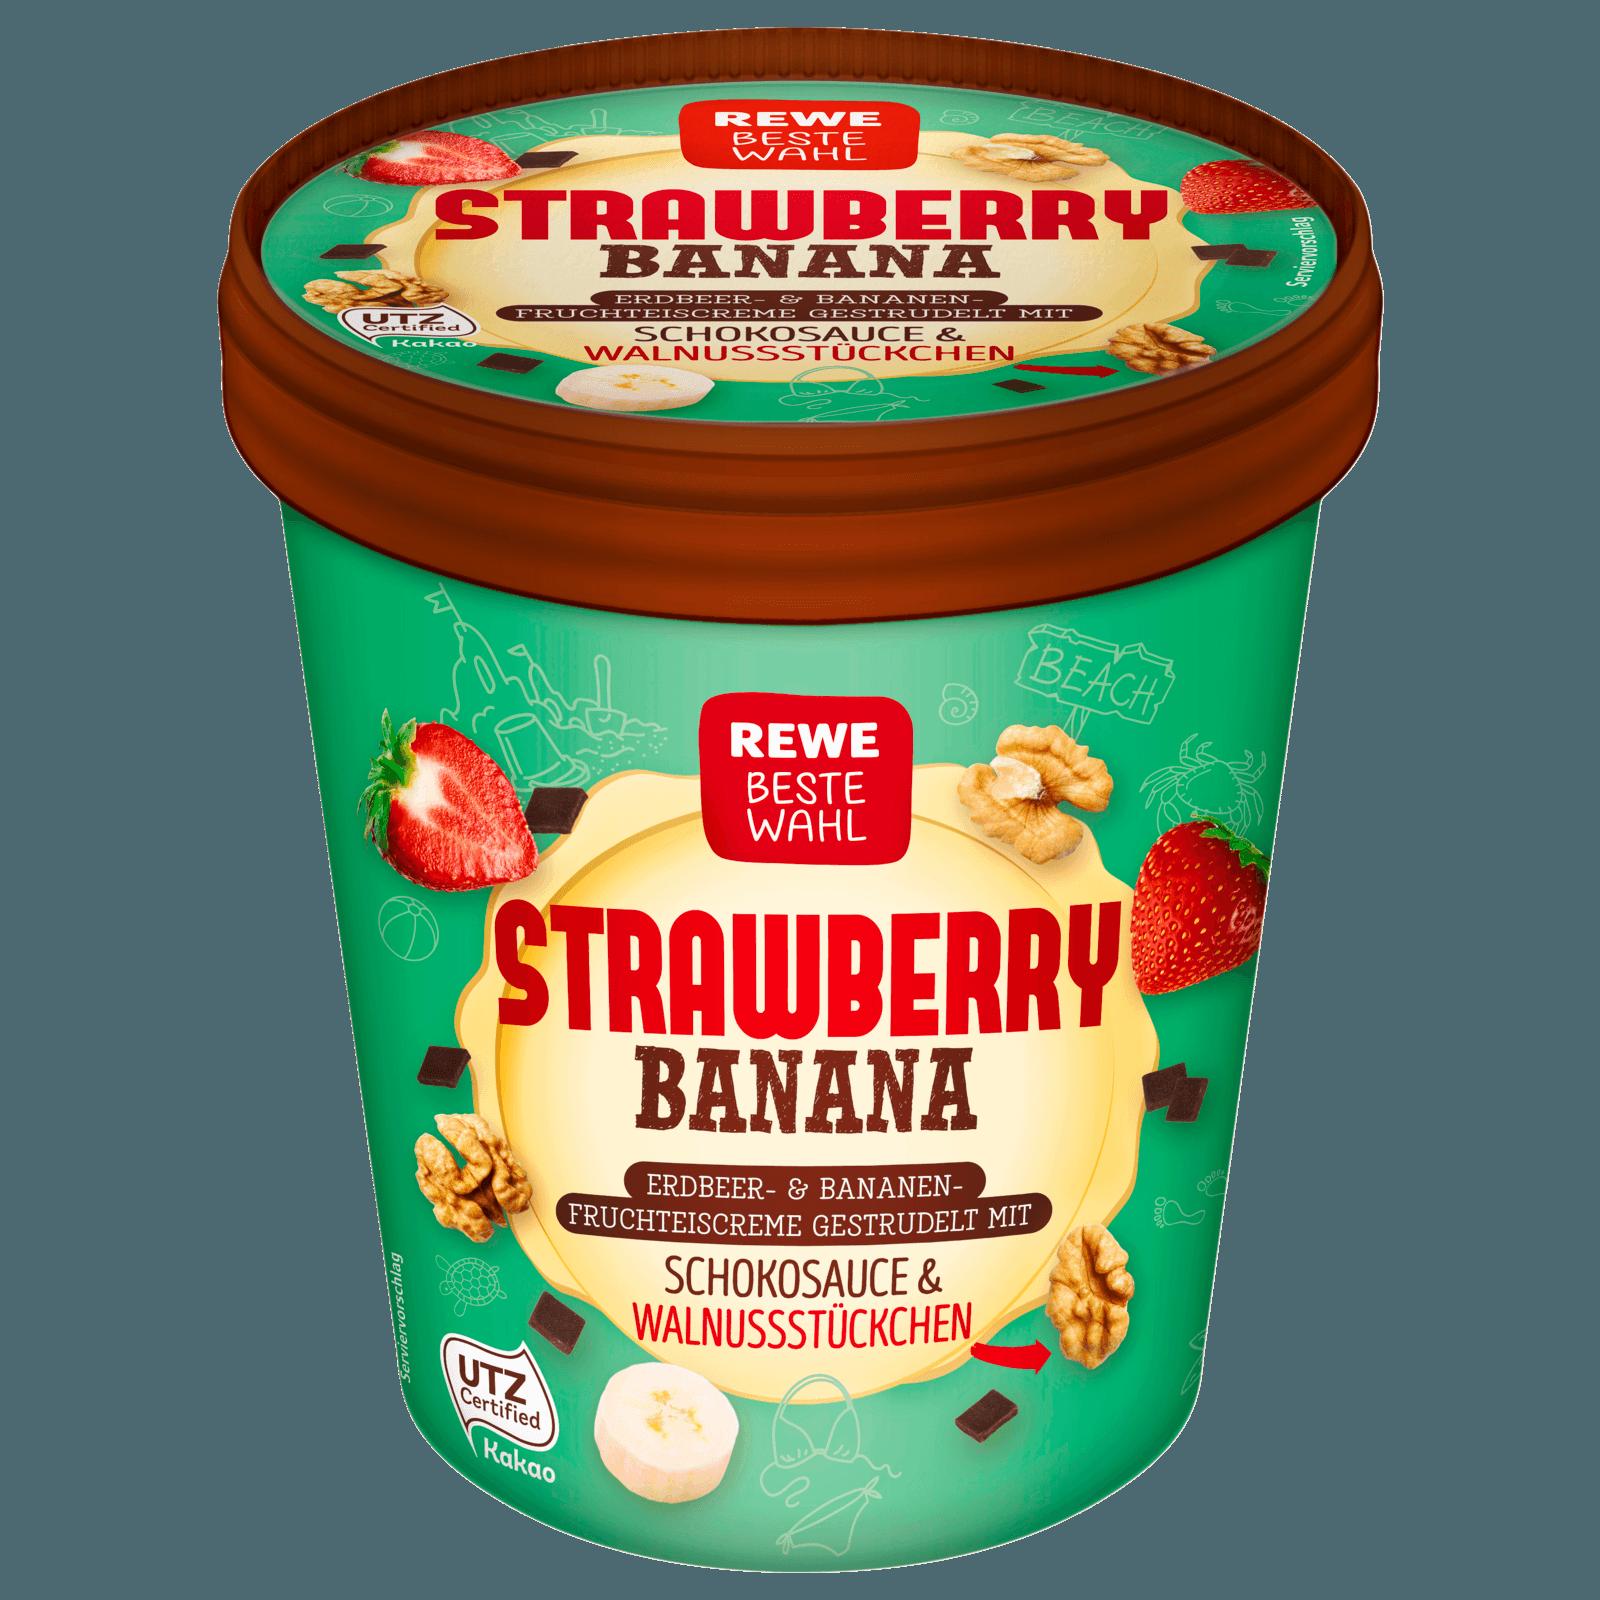 Rewe Beste Wahl Strawberry Banana 500ml Bei Rewe Online Bestellen